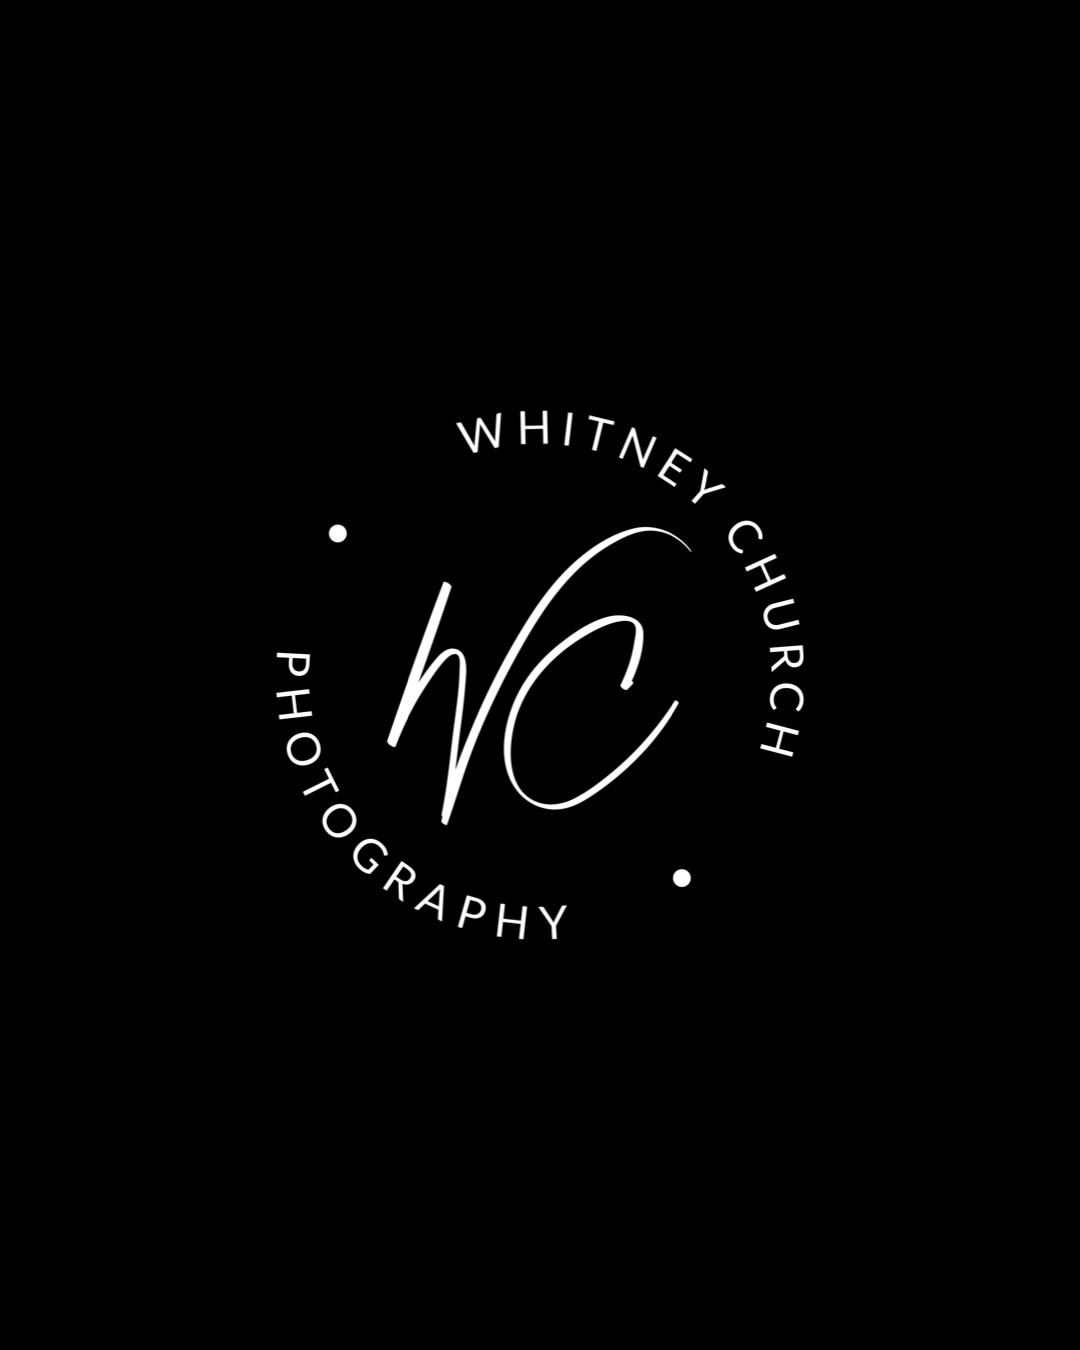 Whitney Church Photography